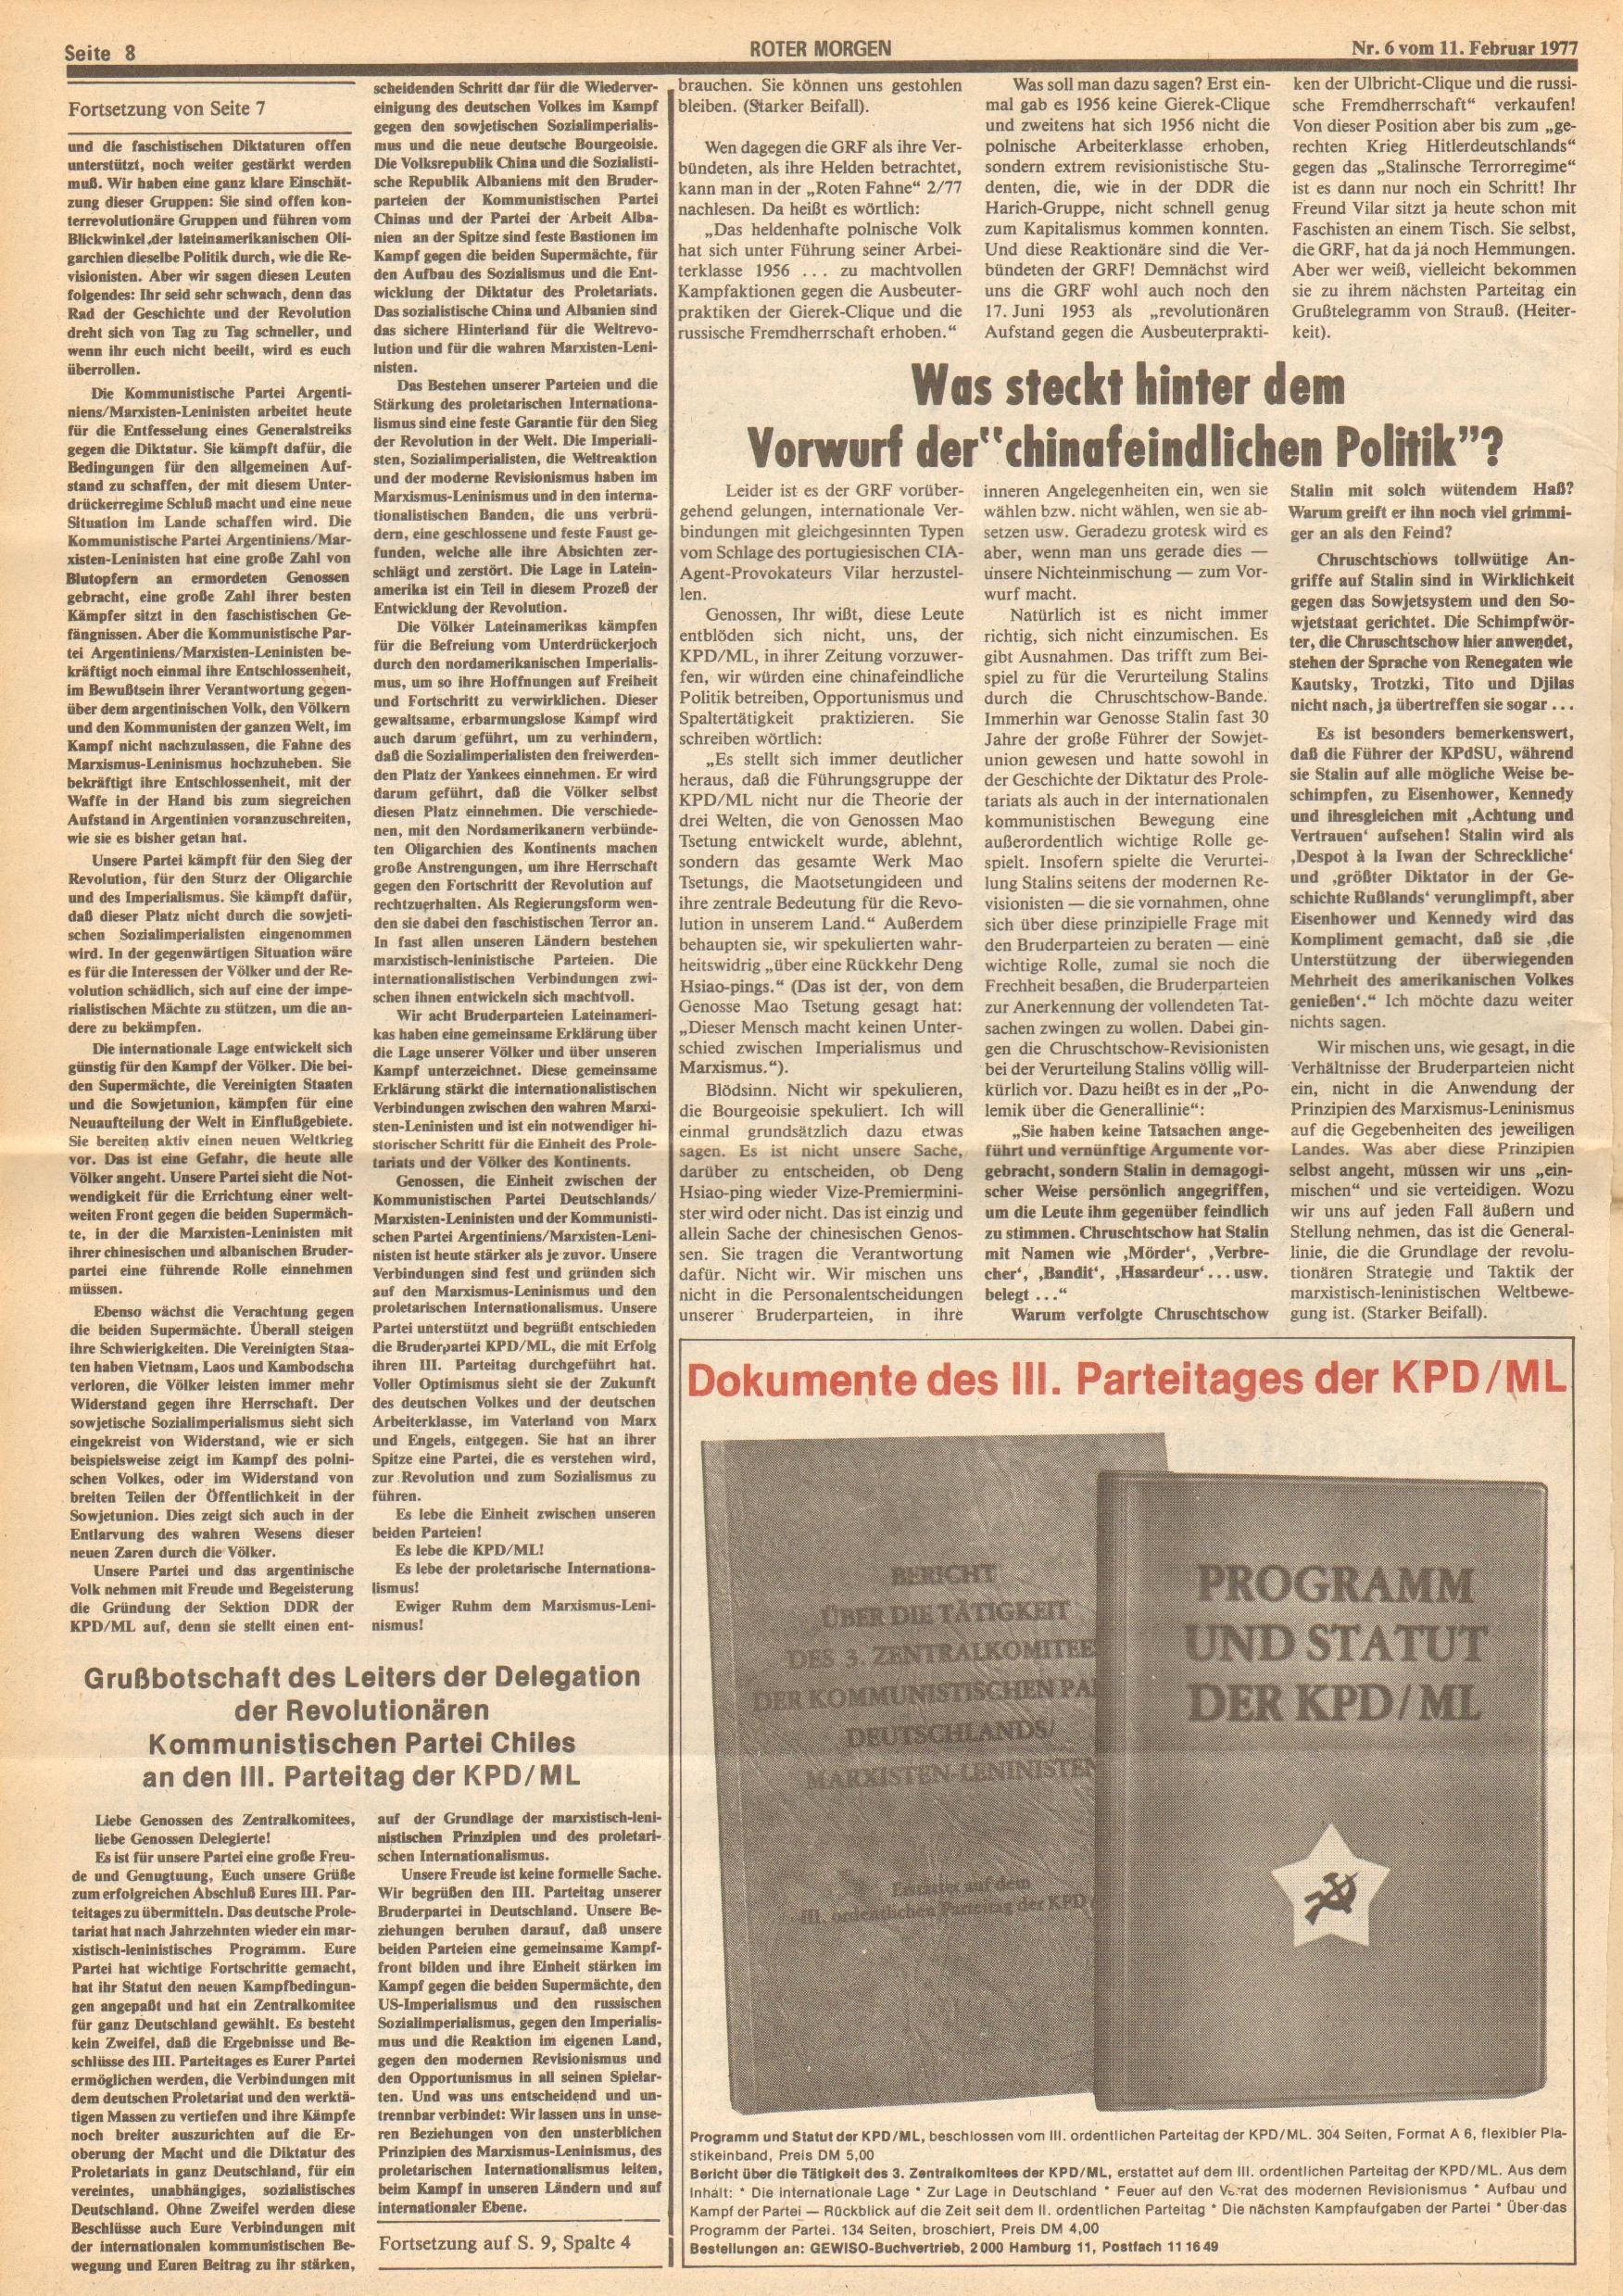 Roter Morgen, 11. Jg., 11. Februar 1977, Nr. 6, Seite 8